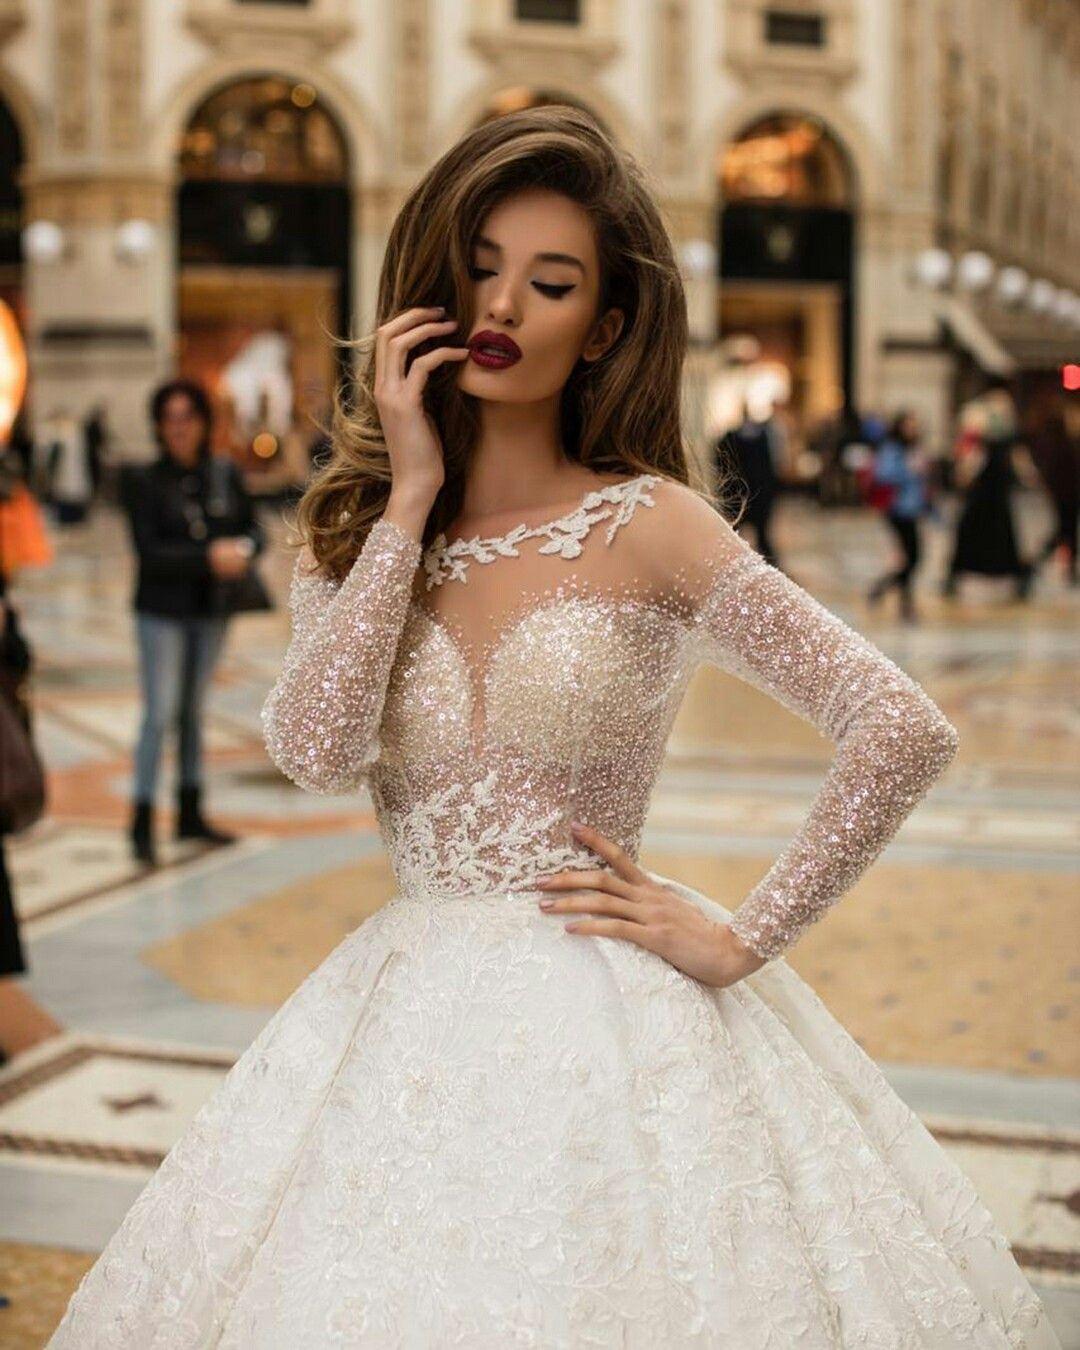 Target Wedding Dresses.Wedding Dresses At Target Saddha